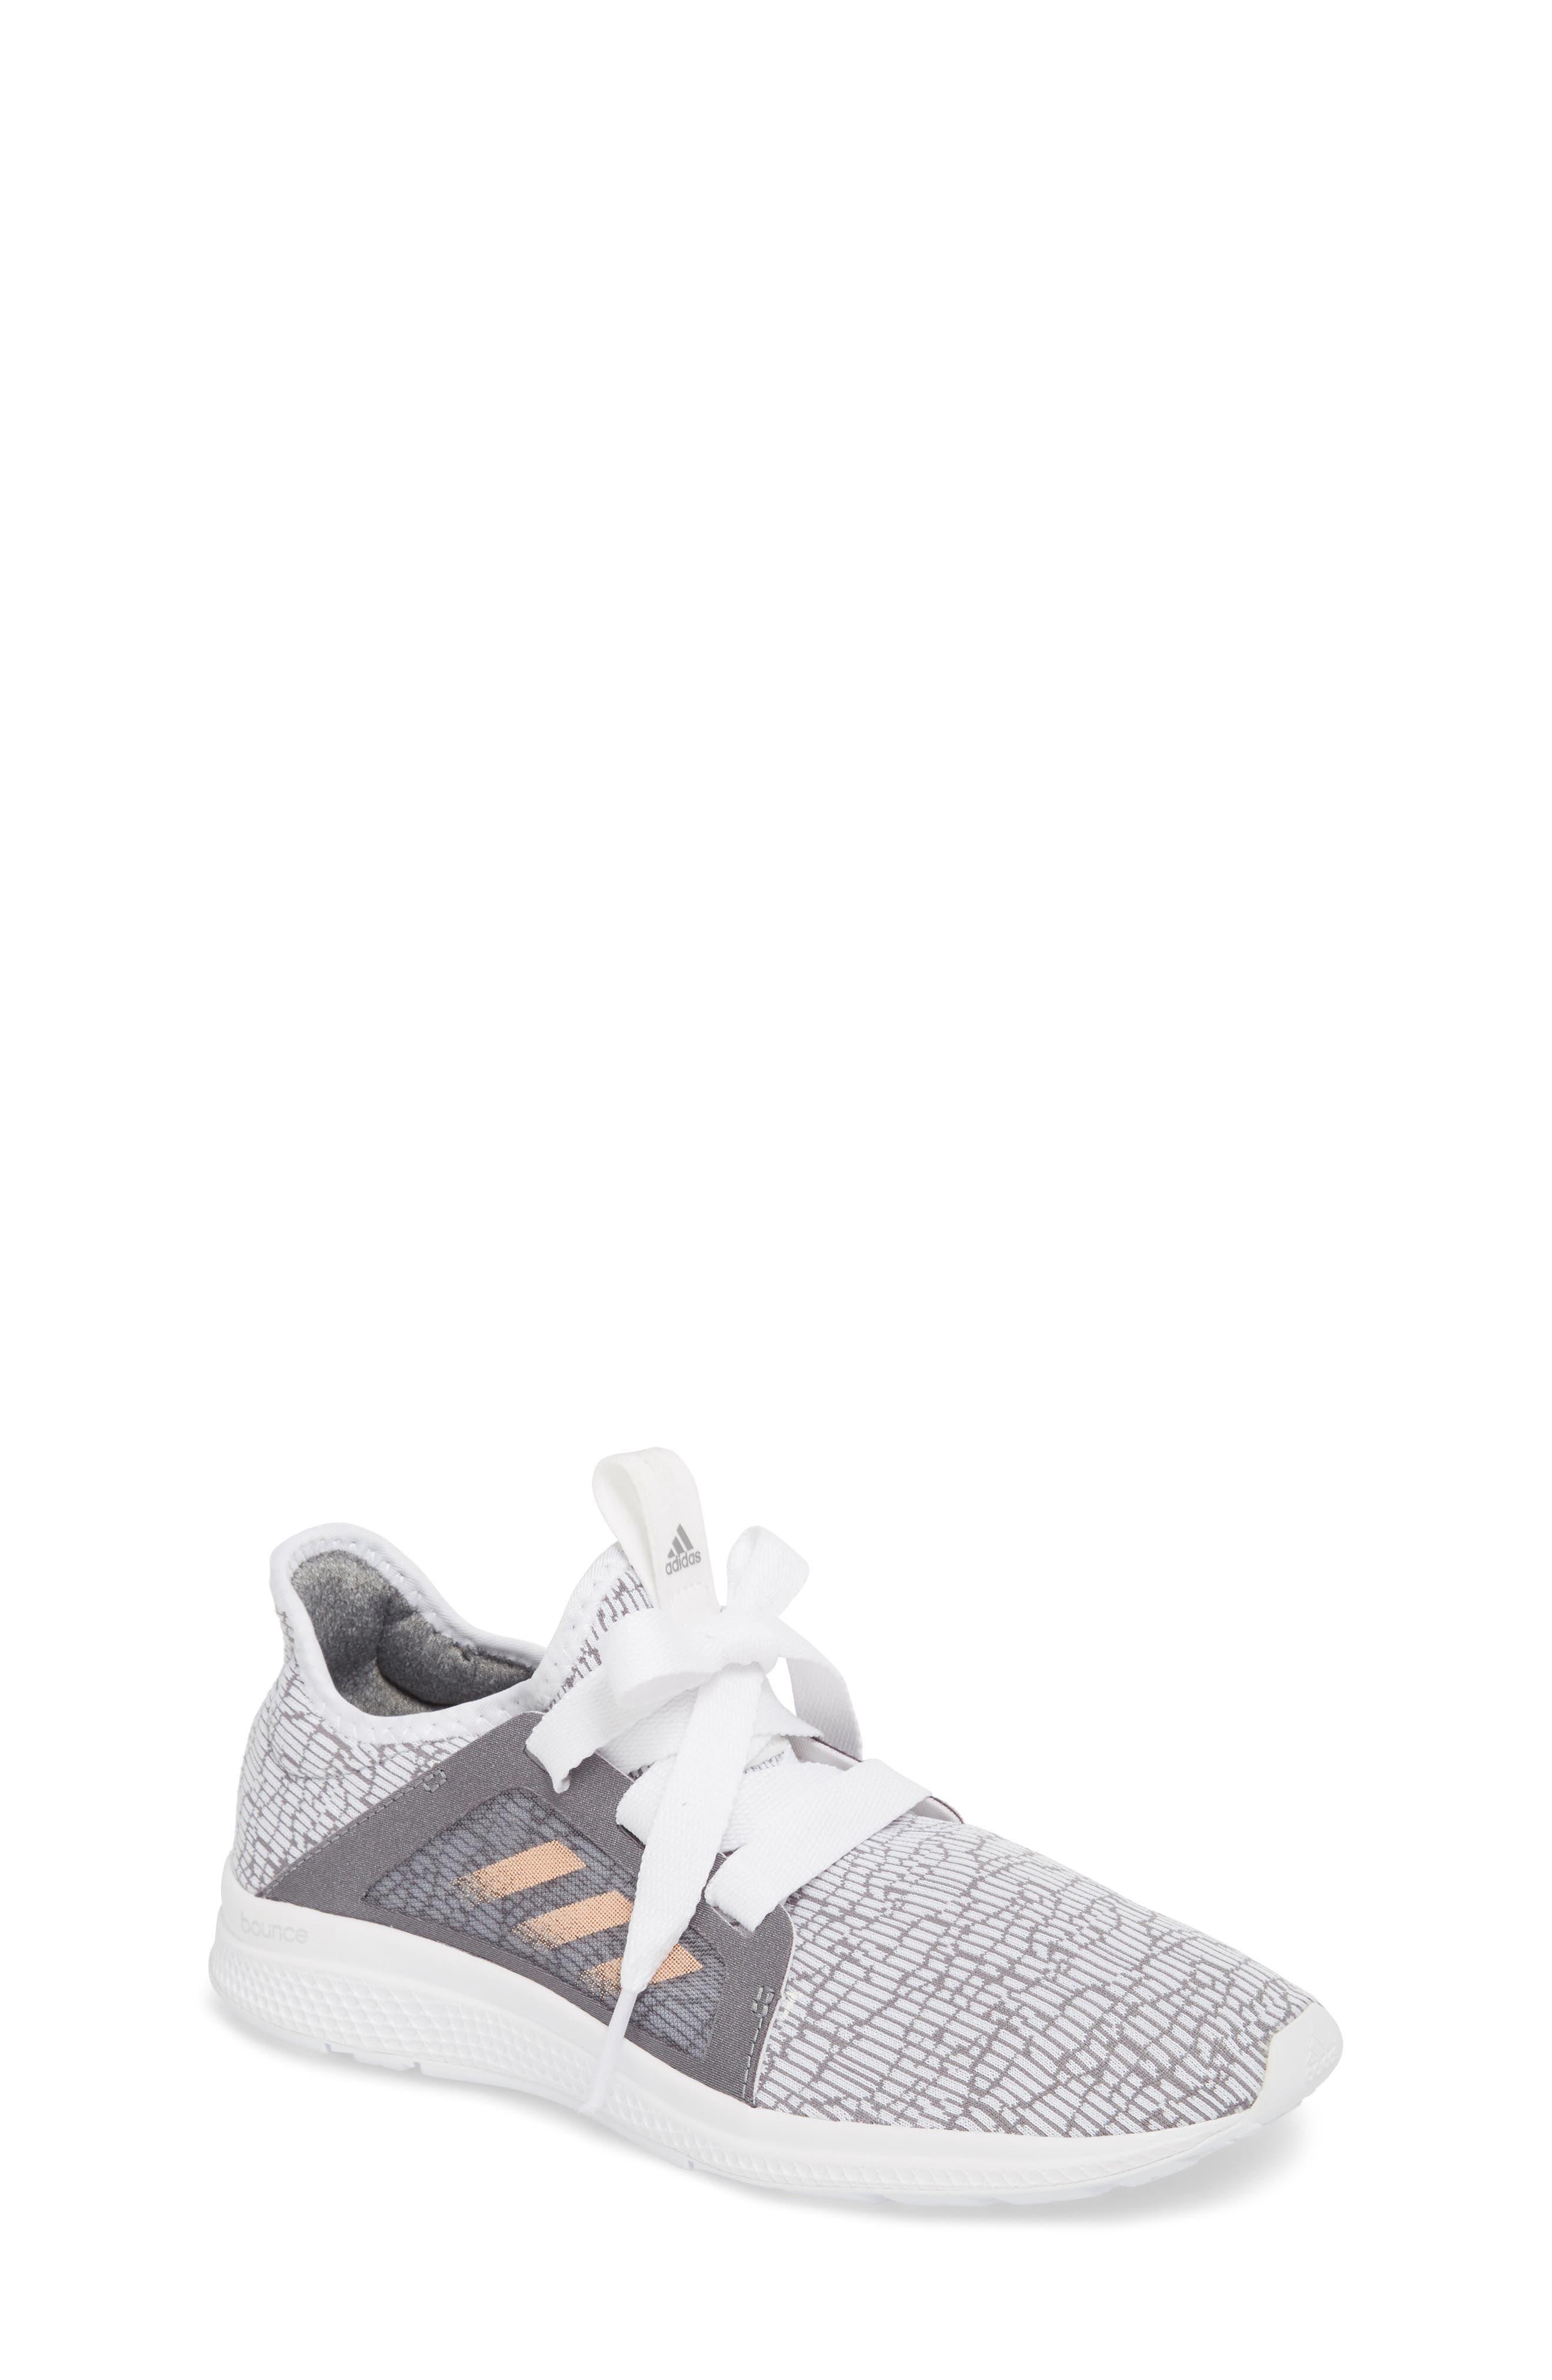 ADIDAS Edge Lux Running Shoe, Main, color, 036